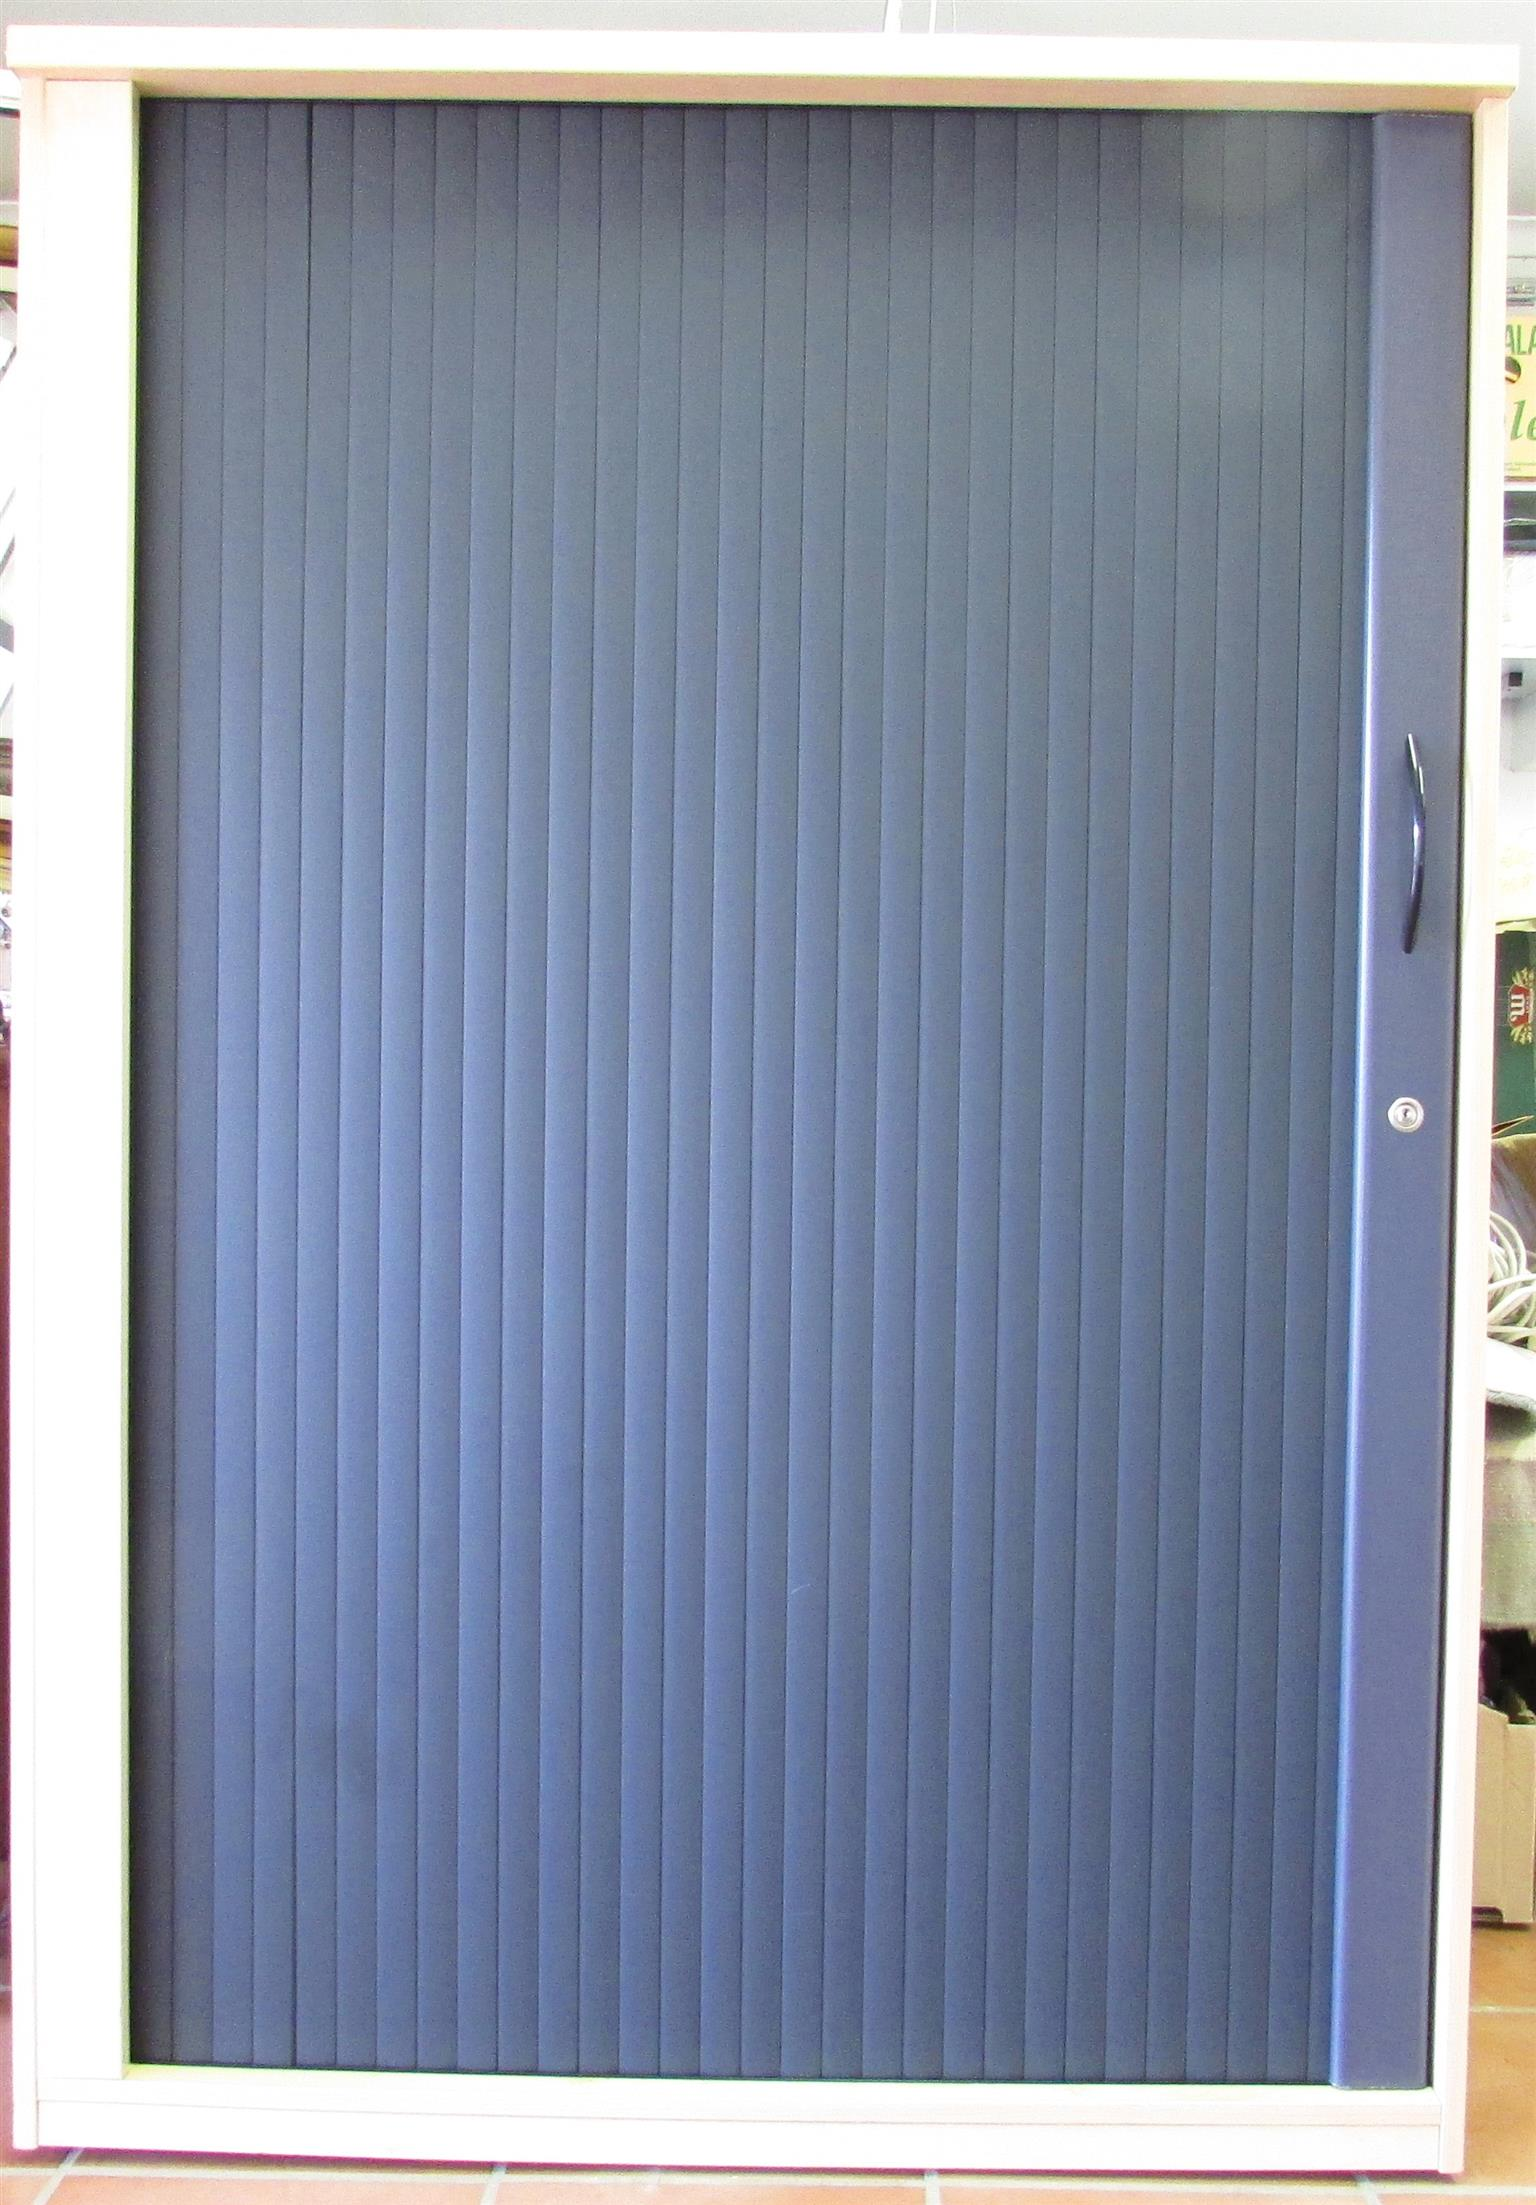 MAPLE ROLLER SHUTTER DOOR FILING CABINET & MAPLE ROLLER SHUTTER DOOR FILING CABINET | Junk Mail